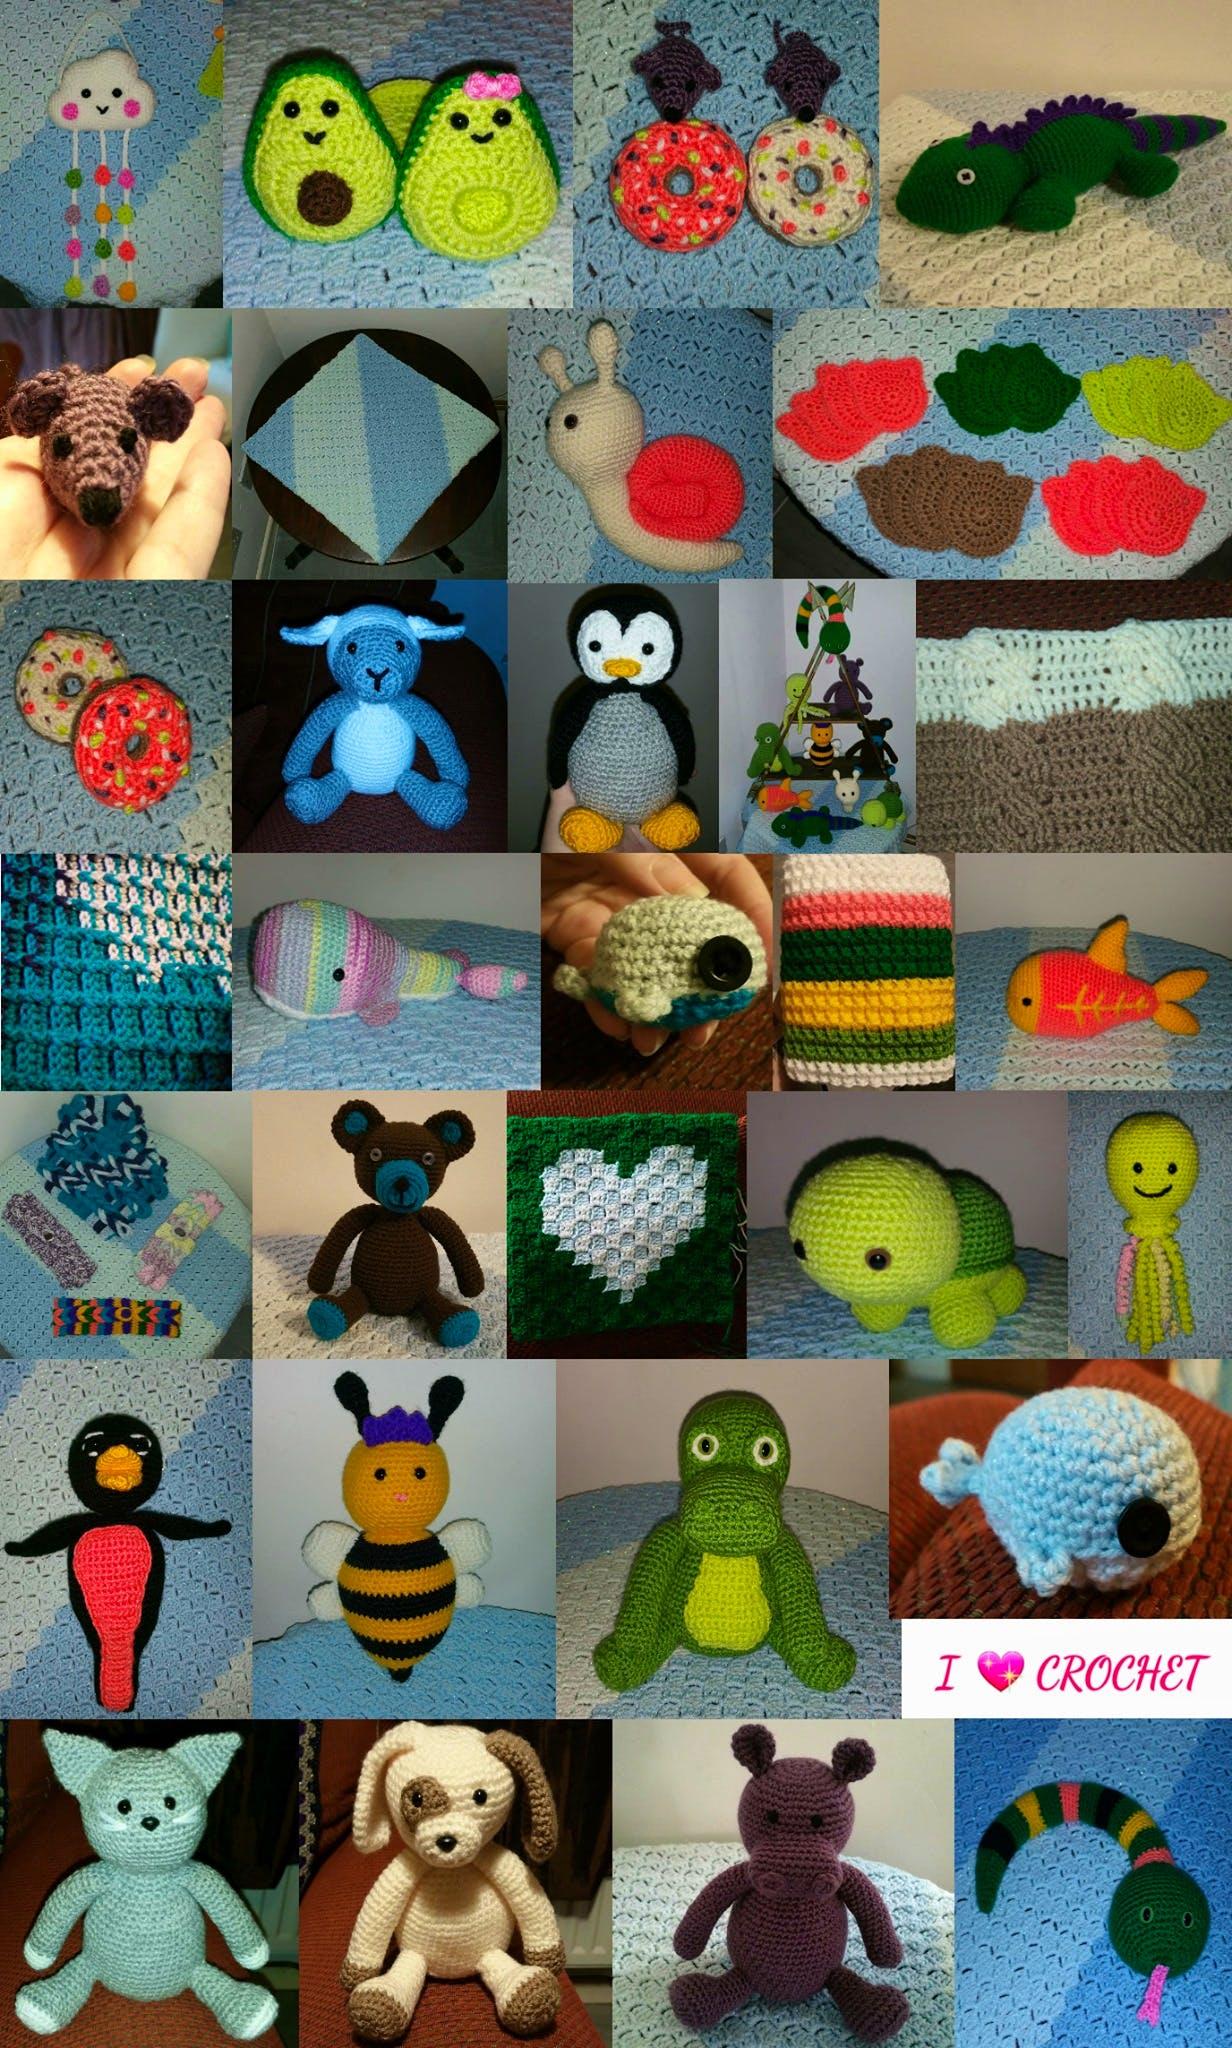 Crochet Away!